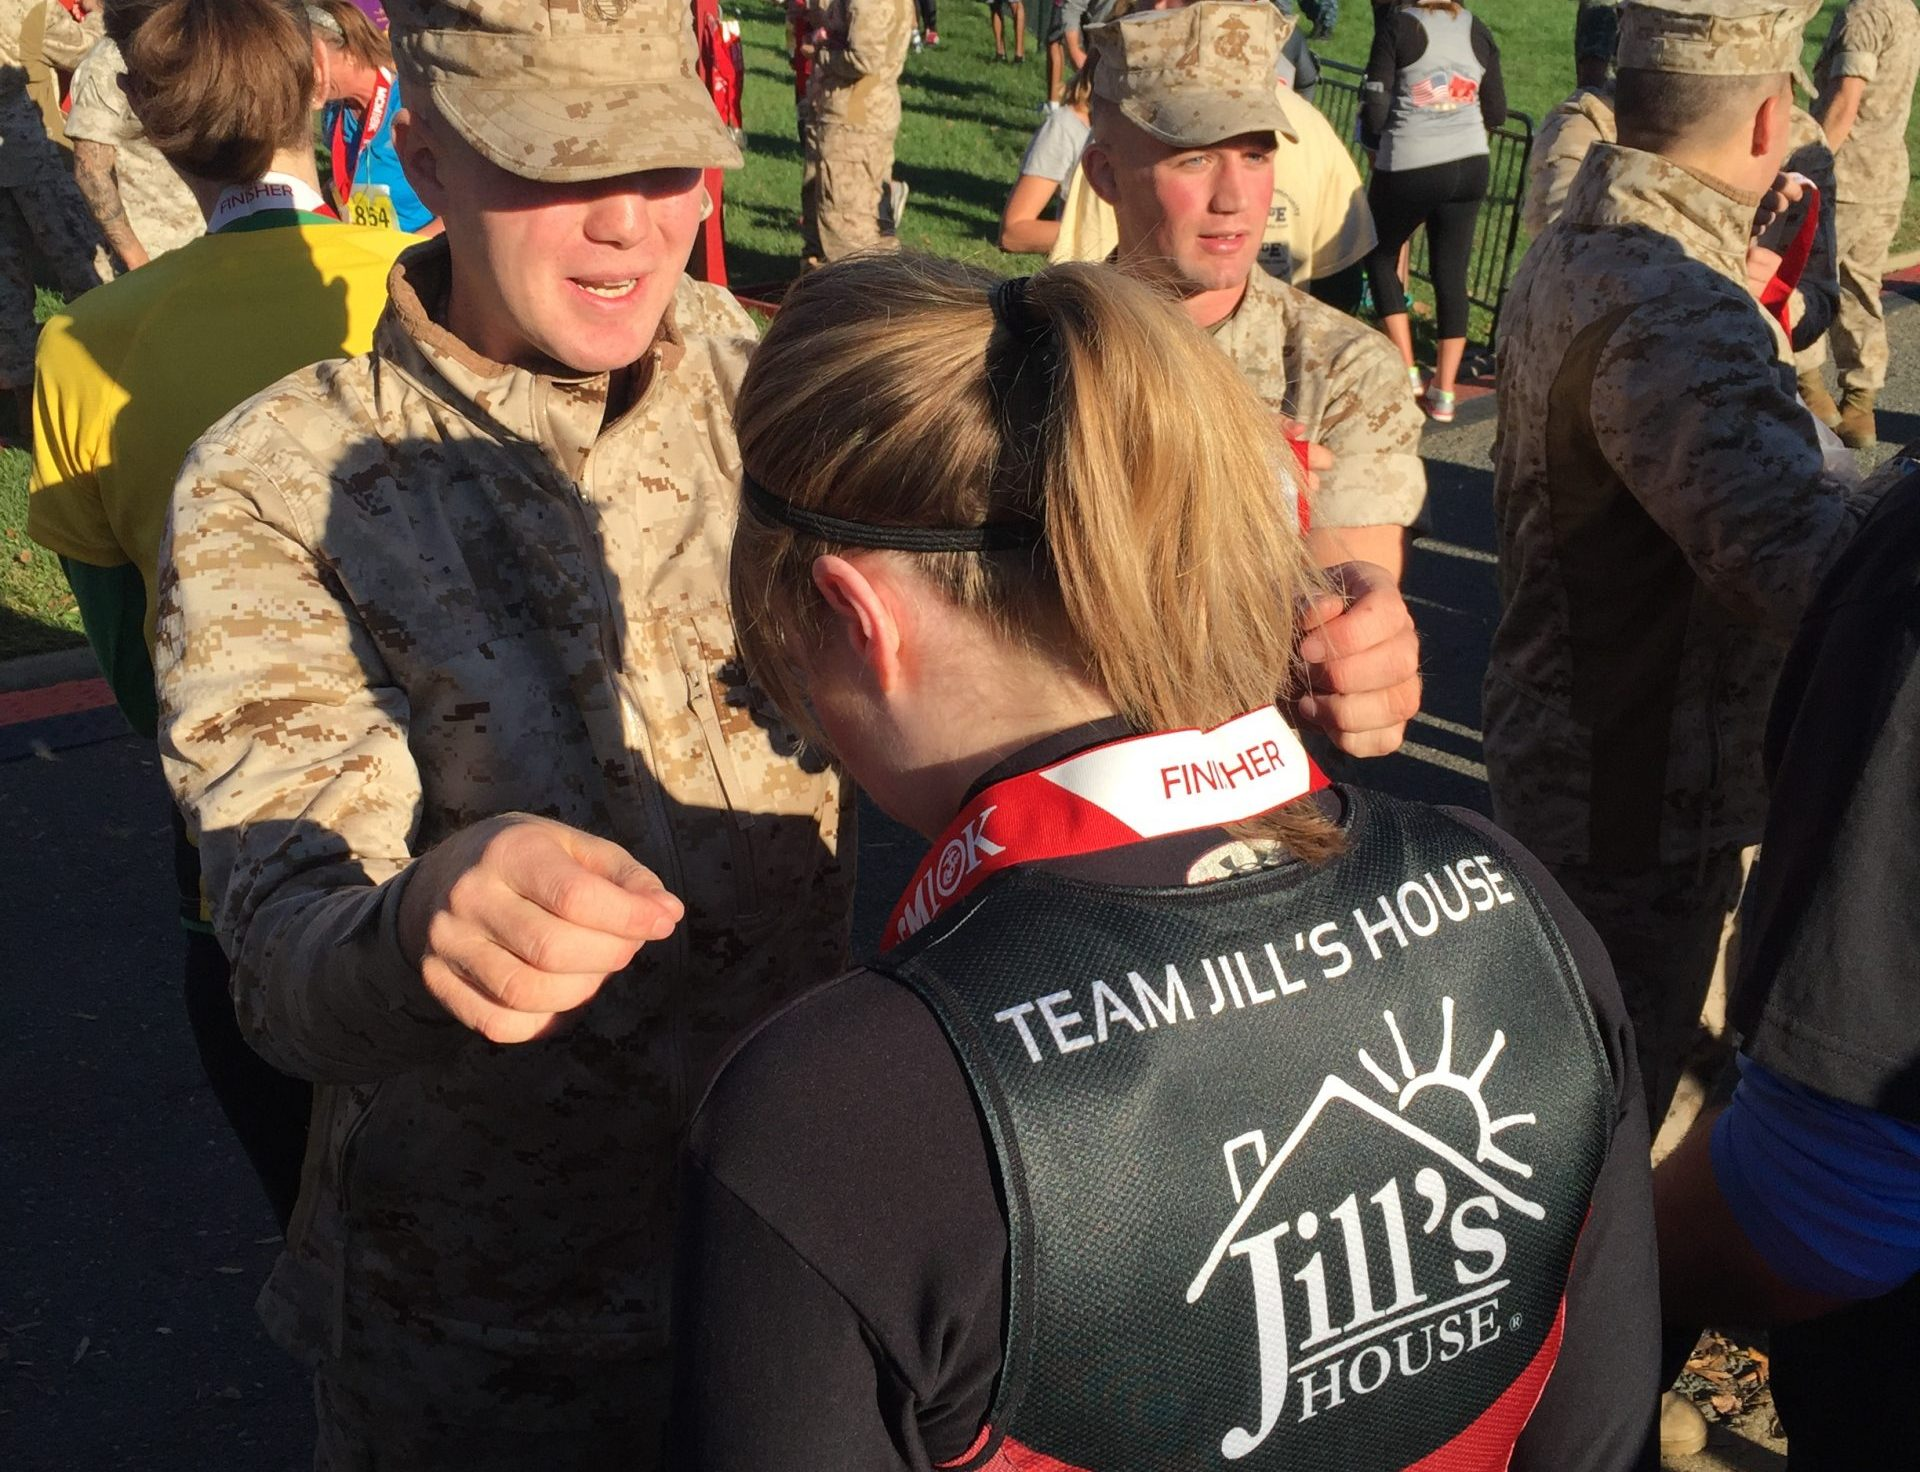 Jill's House Marine Corps Marathon